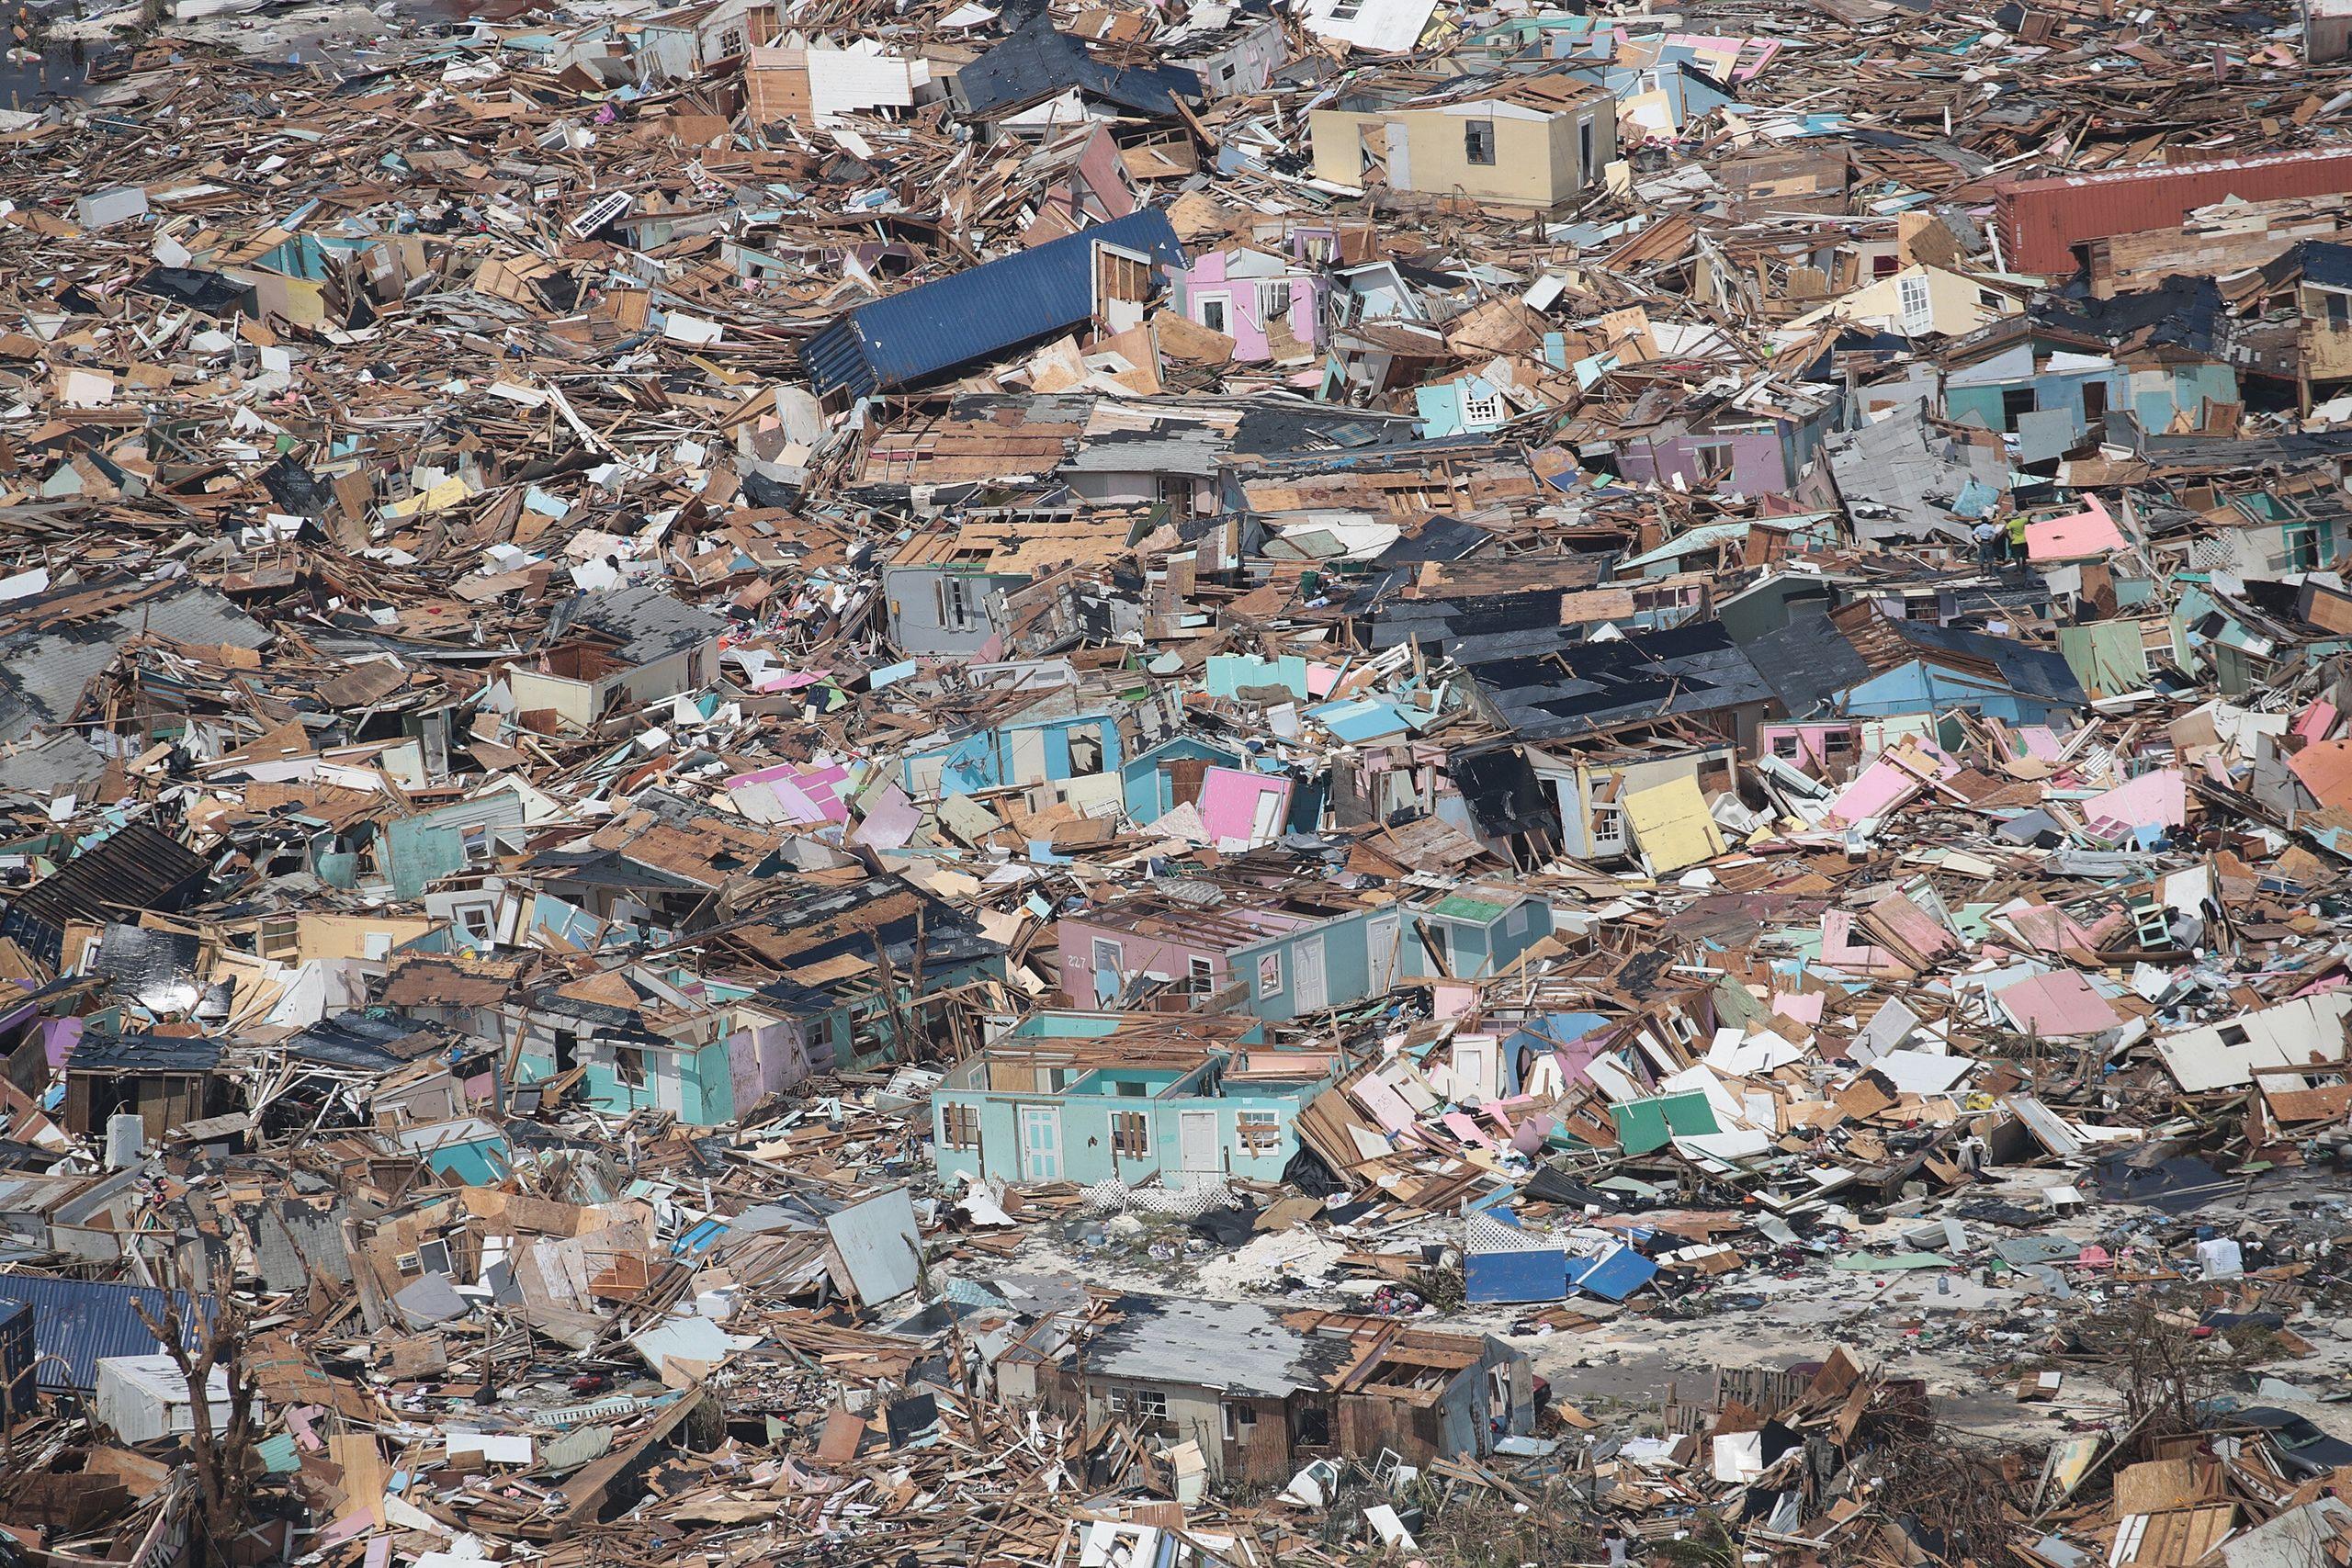 Westlake Legal Group 5d715e65250000e213053f76 Dramatic Images Show Hurricane Dorian Destruction From Above